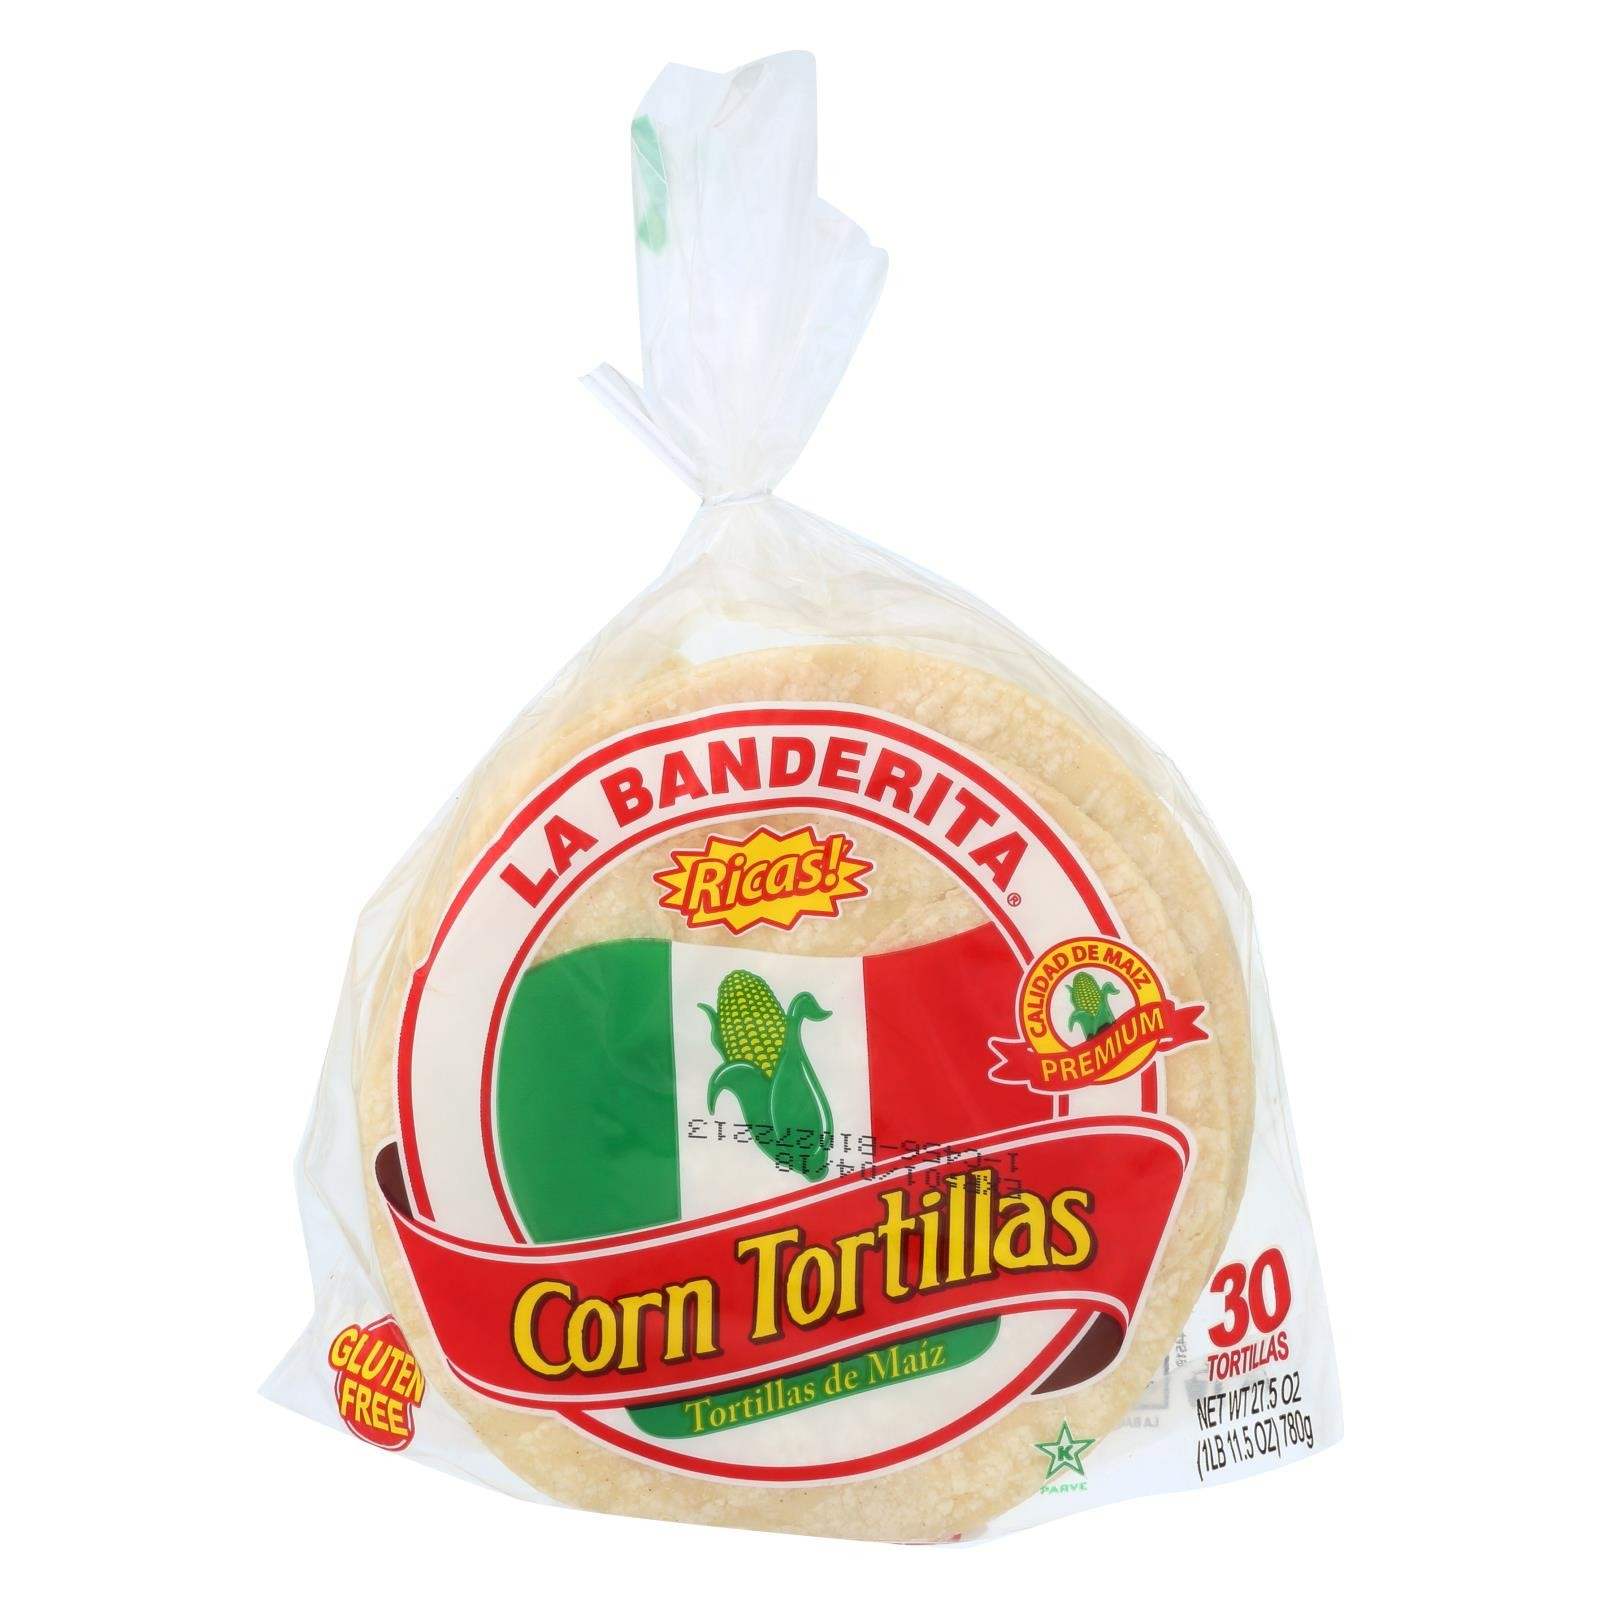 La Banderita Corn Tortillas - Rica's - Pack of 12 - 27.5 Oz.